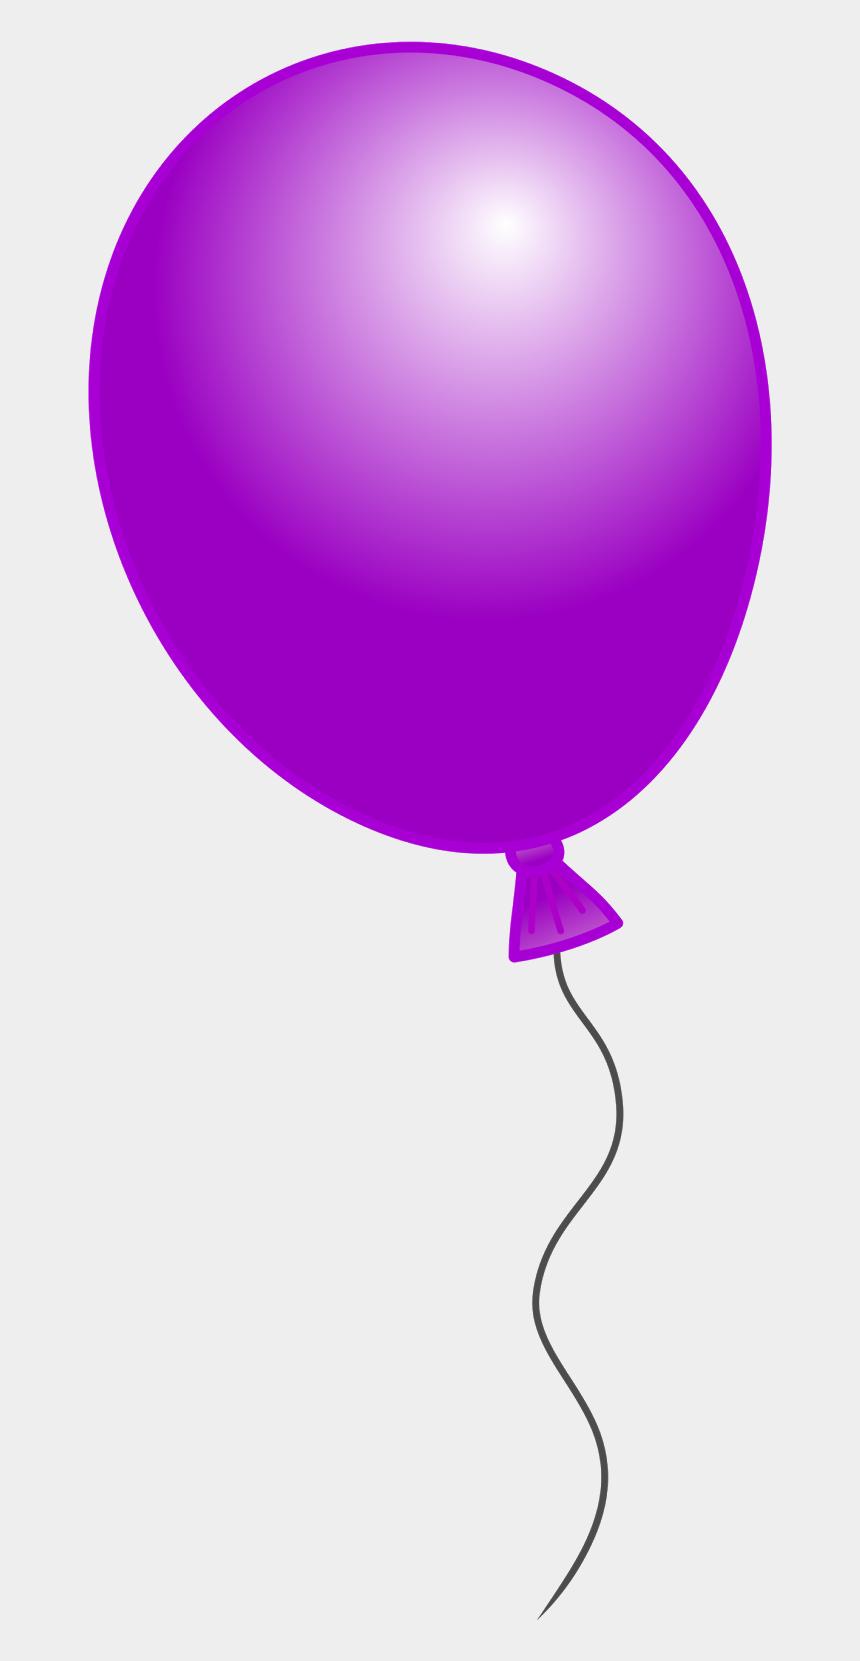 birthday balloons clip art, Cartoons - Balloon Clipart Number - Single Balloon Clipart Png